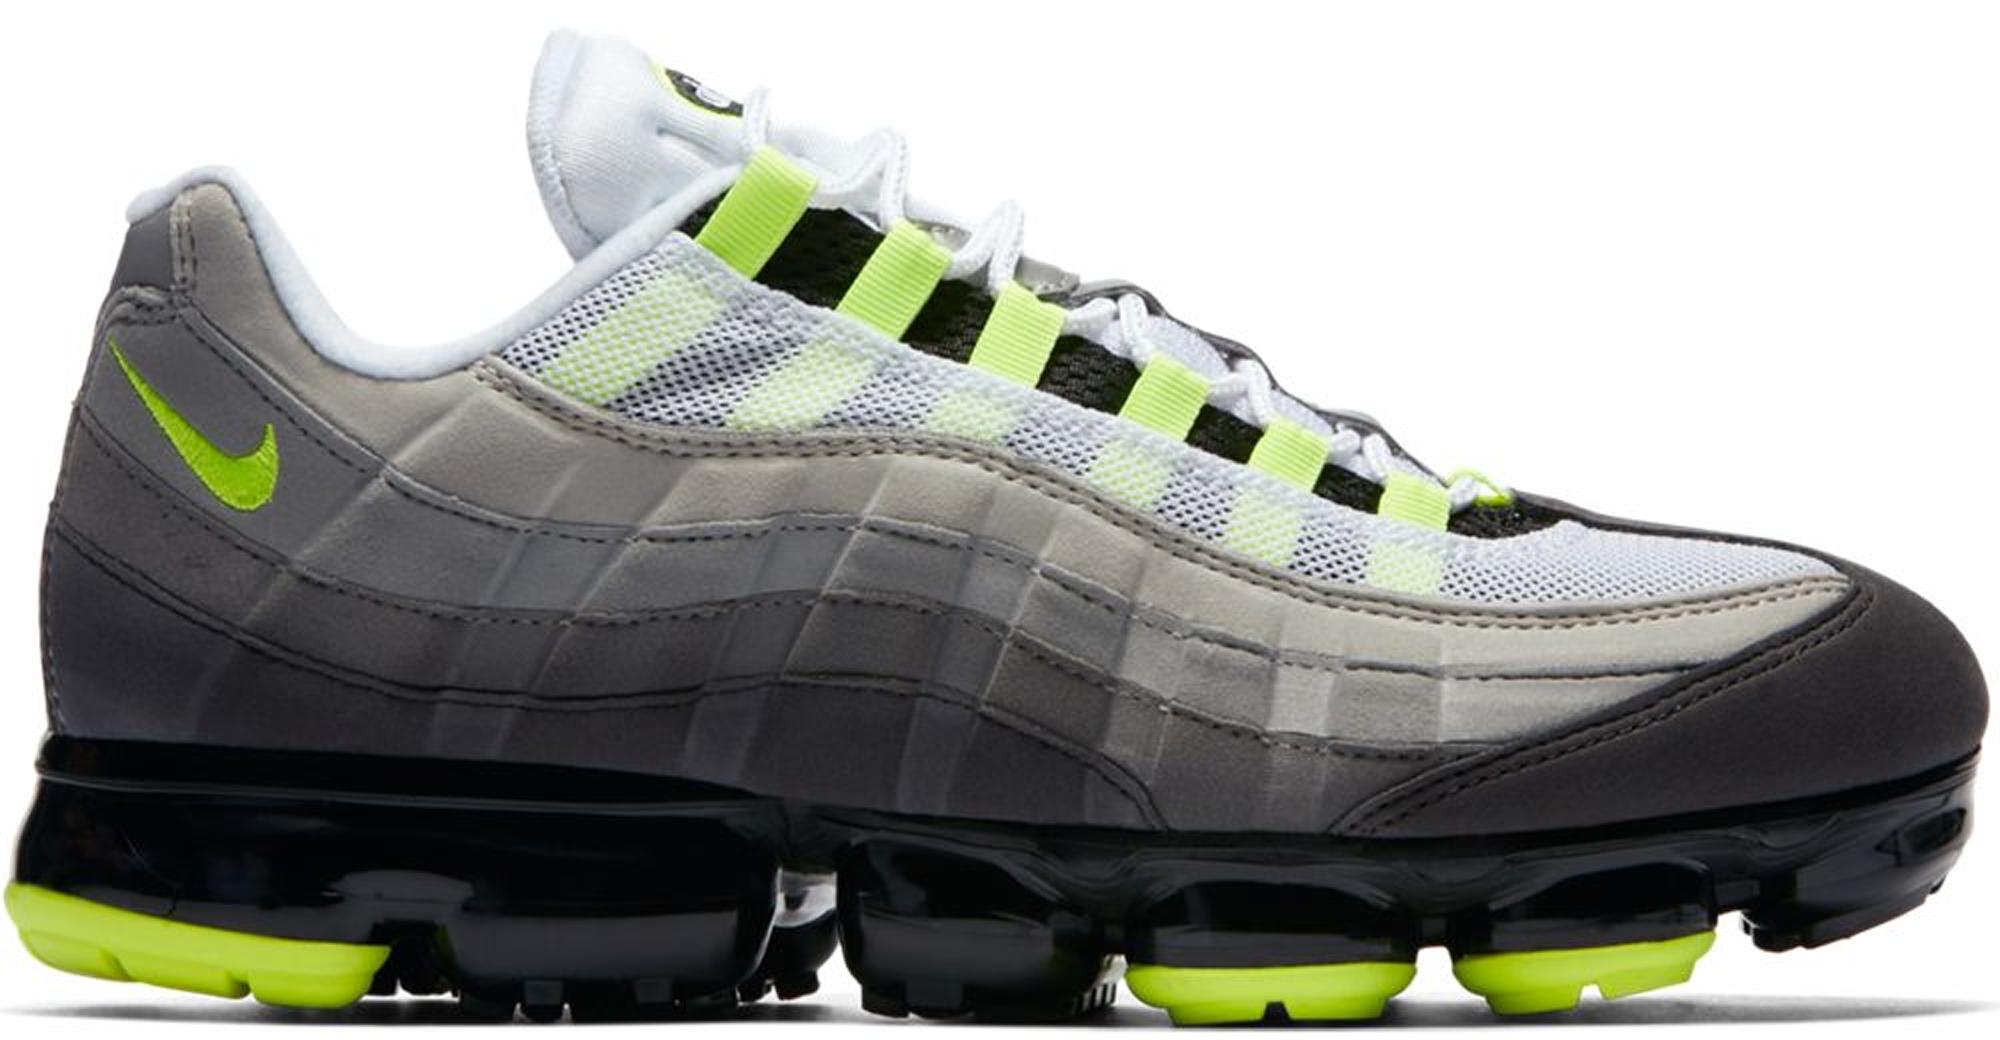 nike air vapormax 95 men's shoe